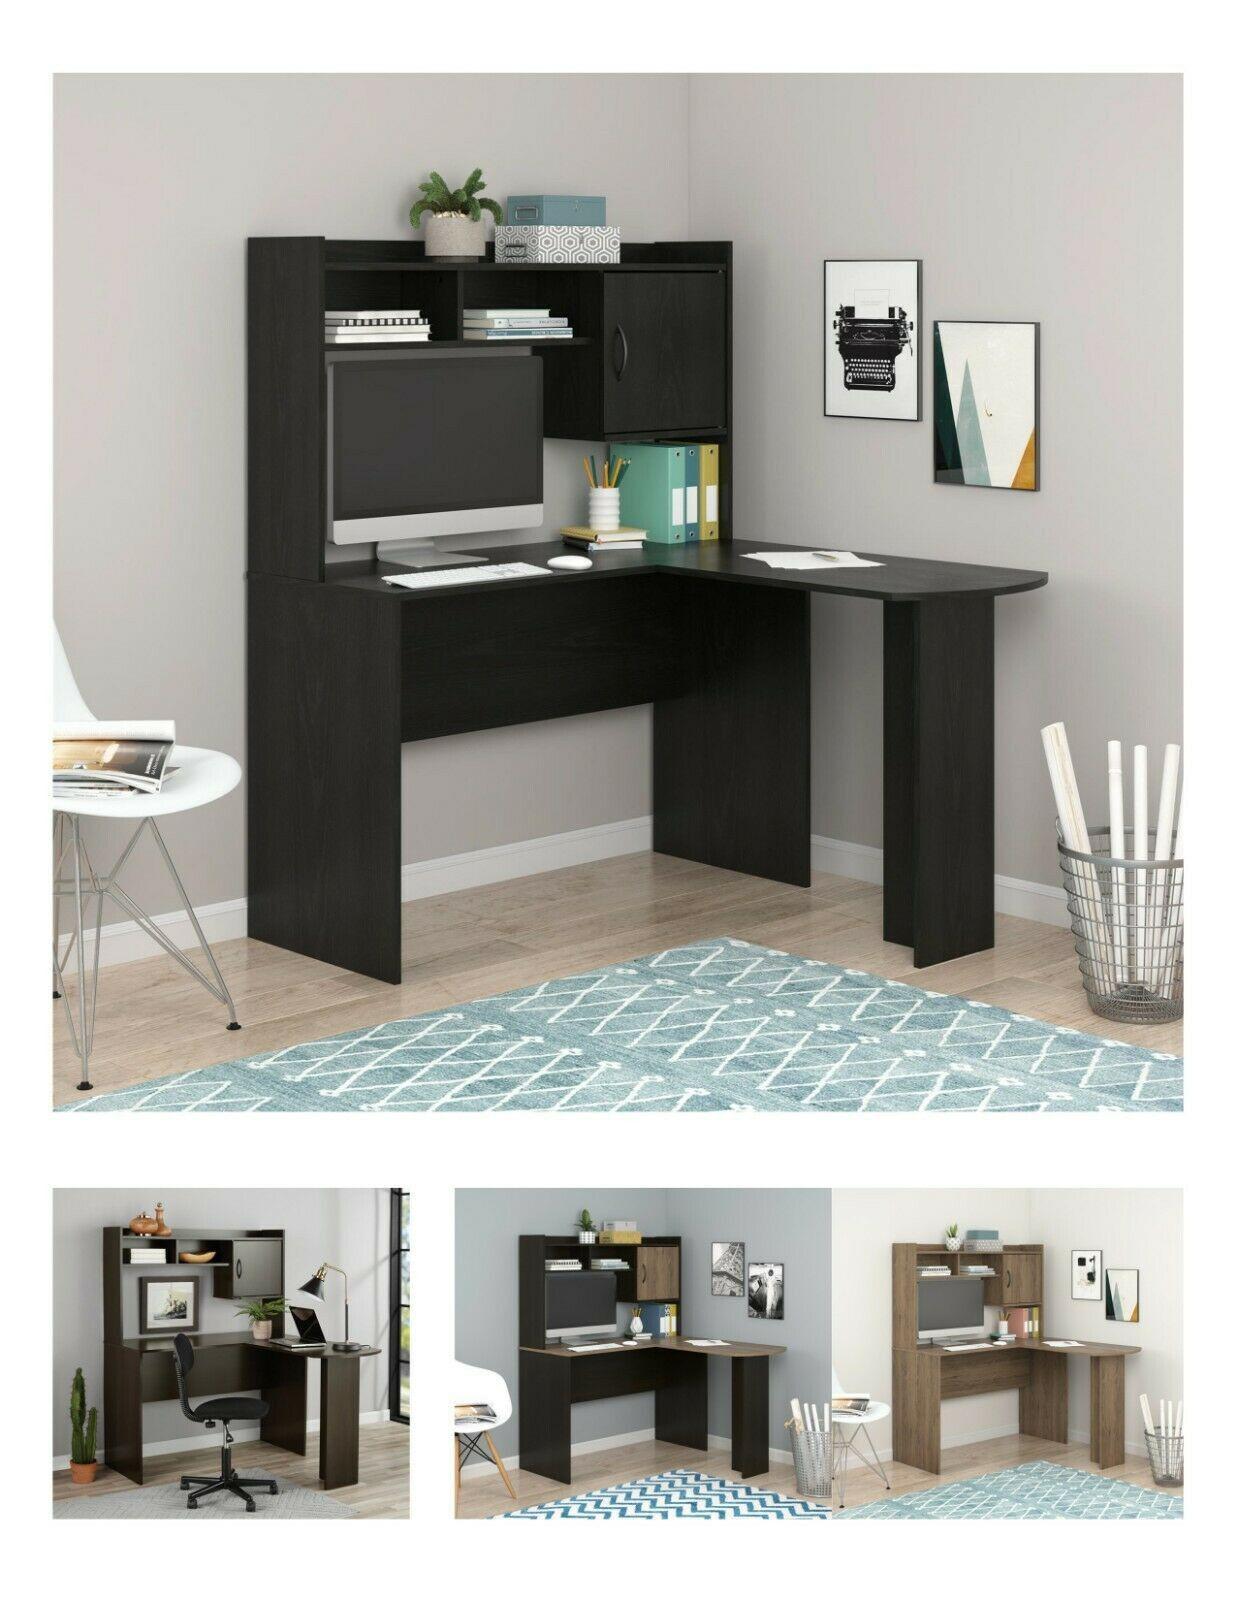 Ameriwood Home Dakota L Shaped Desk With Bookshelves Espresso 2020 In 2020 Bookshelf Desk L Shaped Desk Home